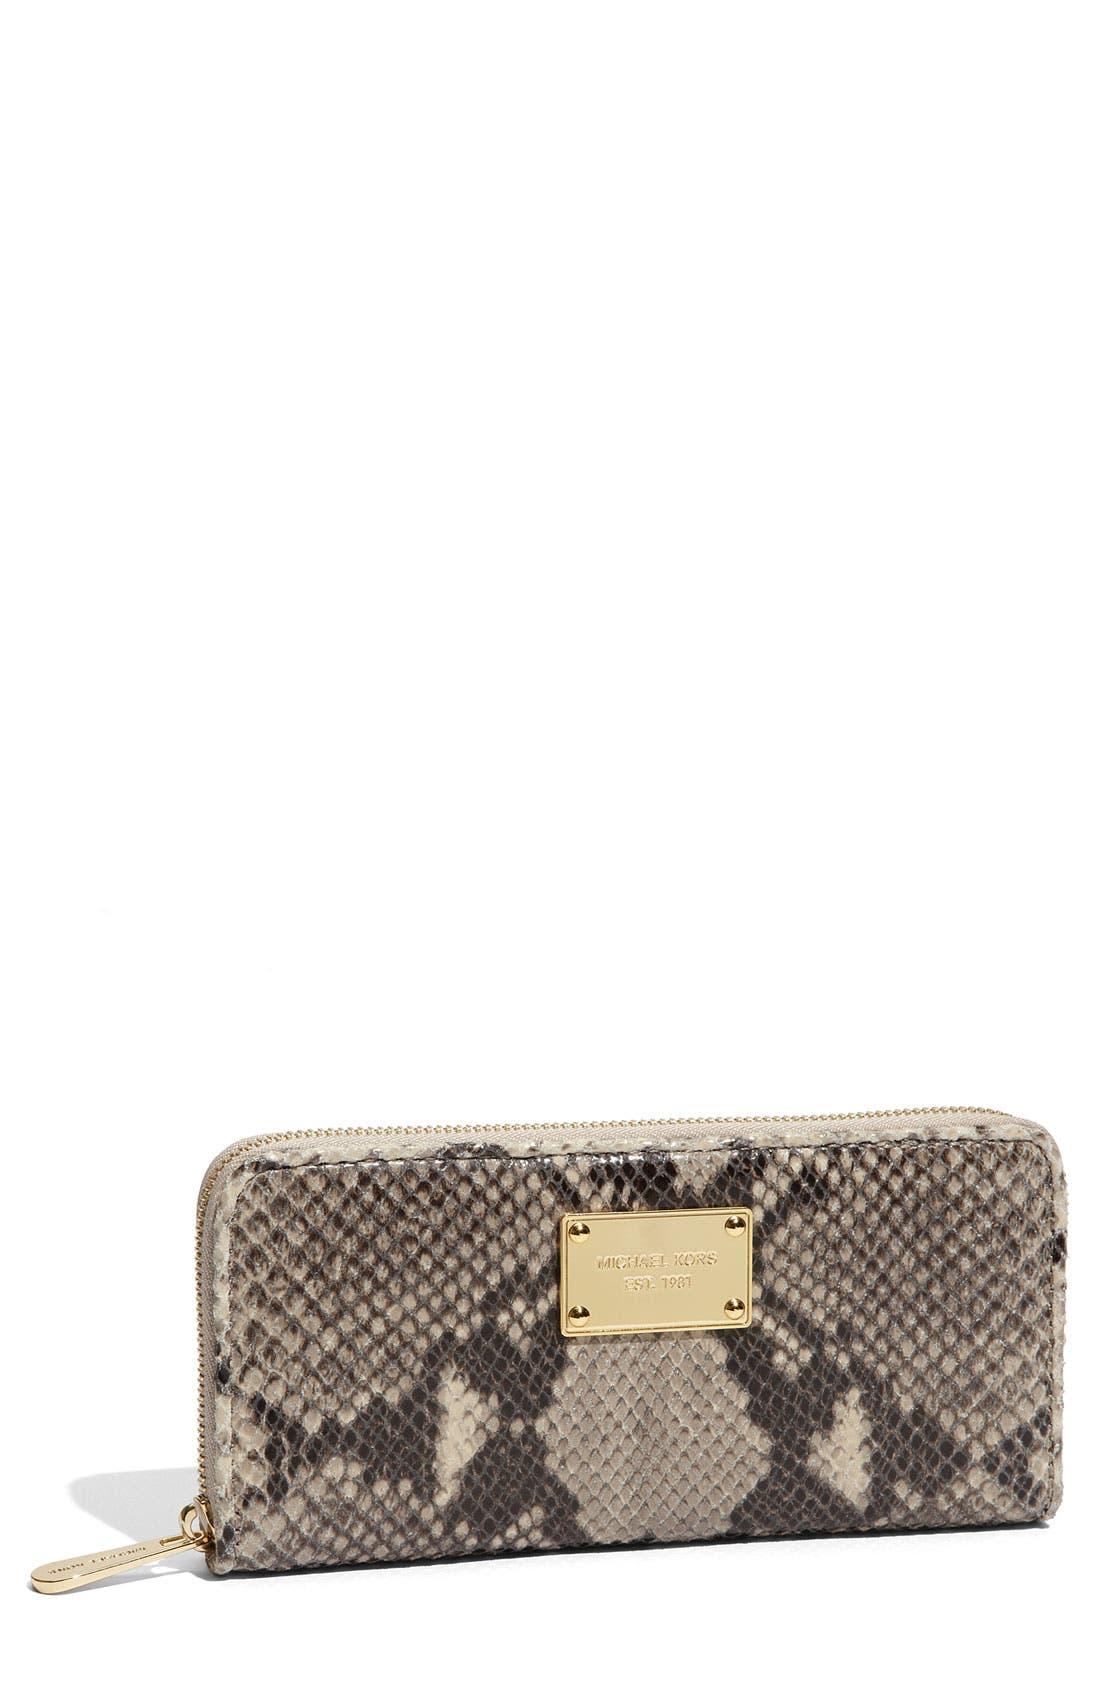 Main Image - MICHAEL Michael Kors 'Jet Set' Snake Embossed Continental Wallet